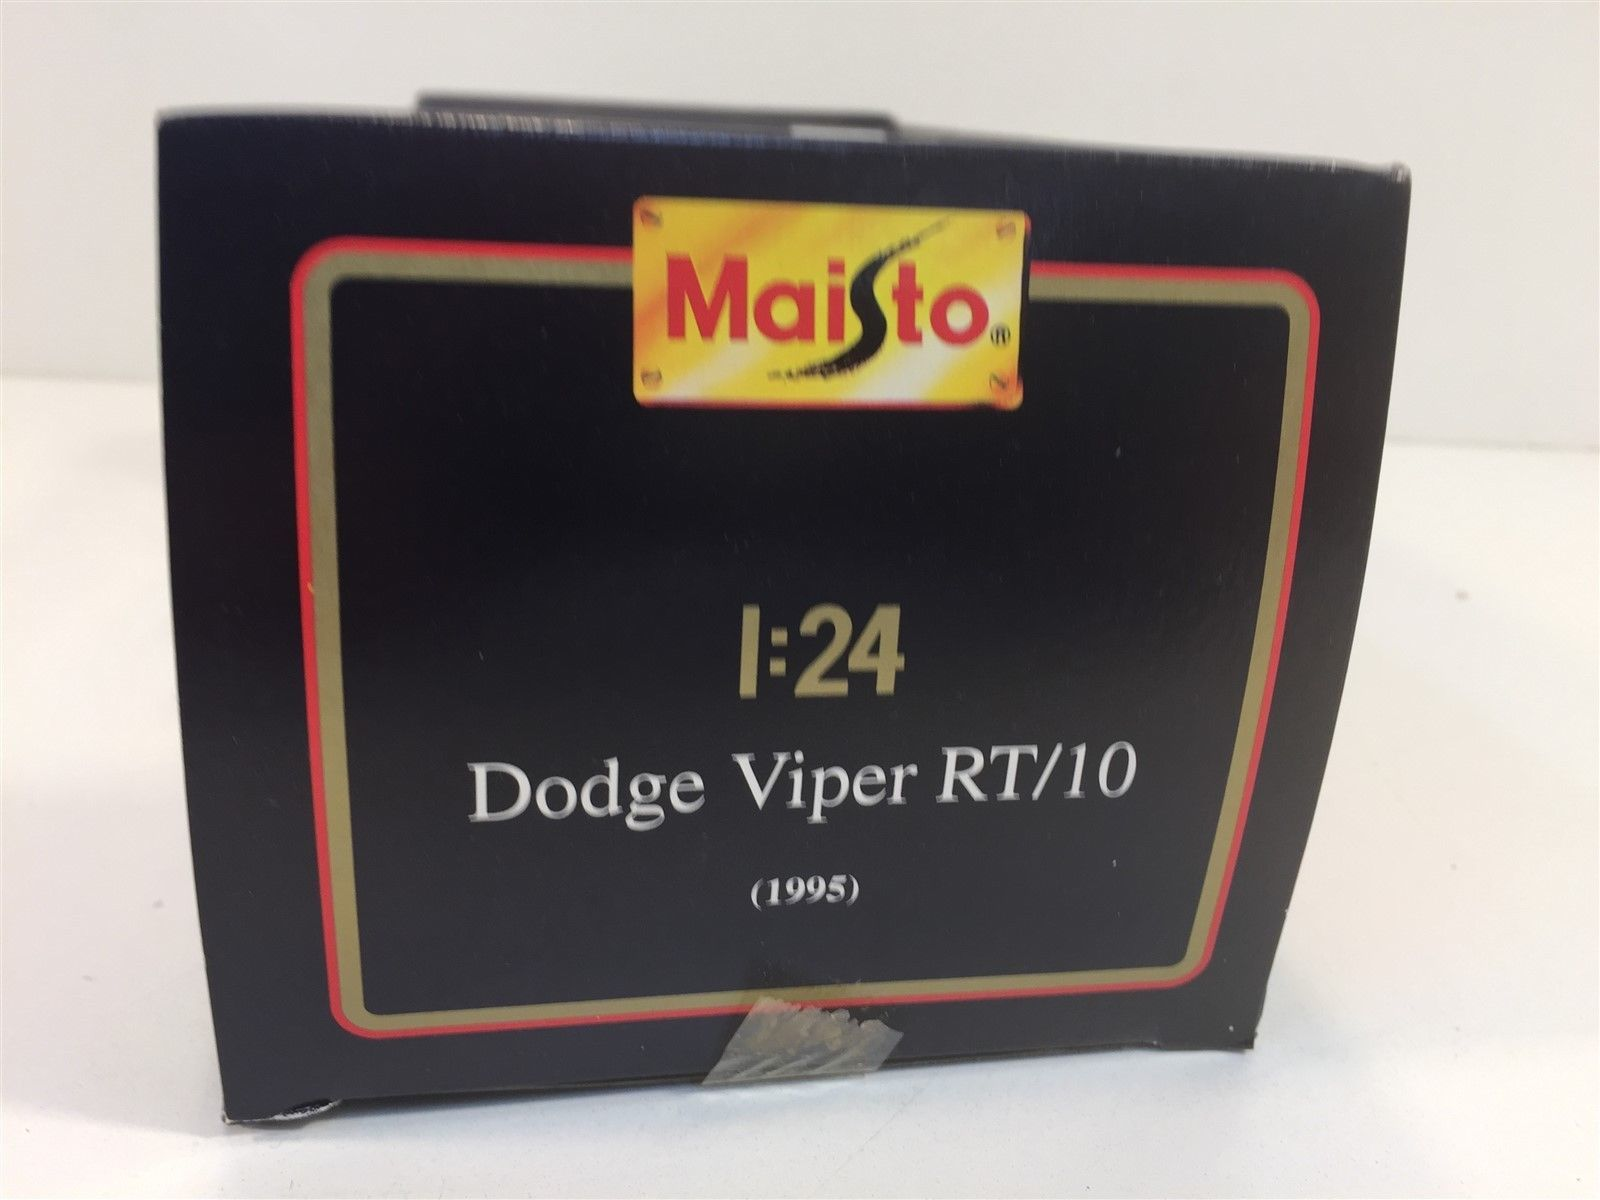 1995 Dodge Viper RT/10 Red Maisto 1:24 NIB Die Cast Metal with Plastic Parts